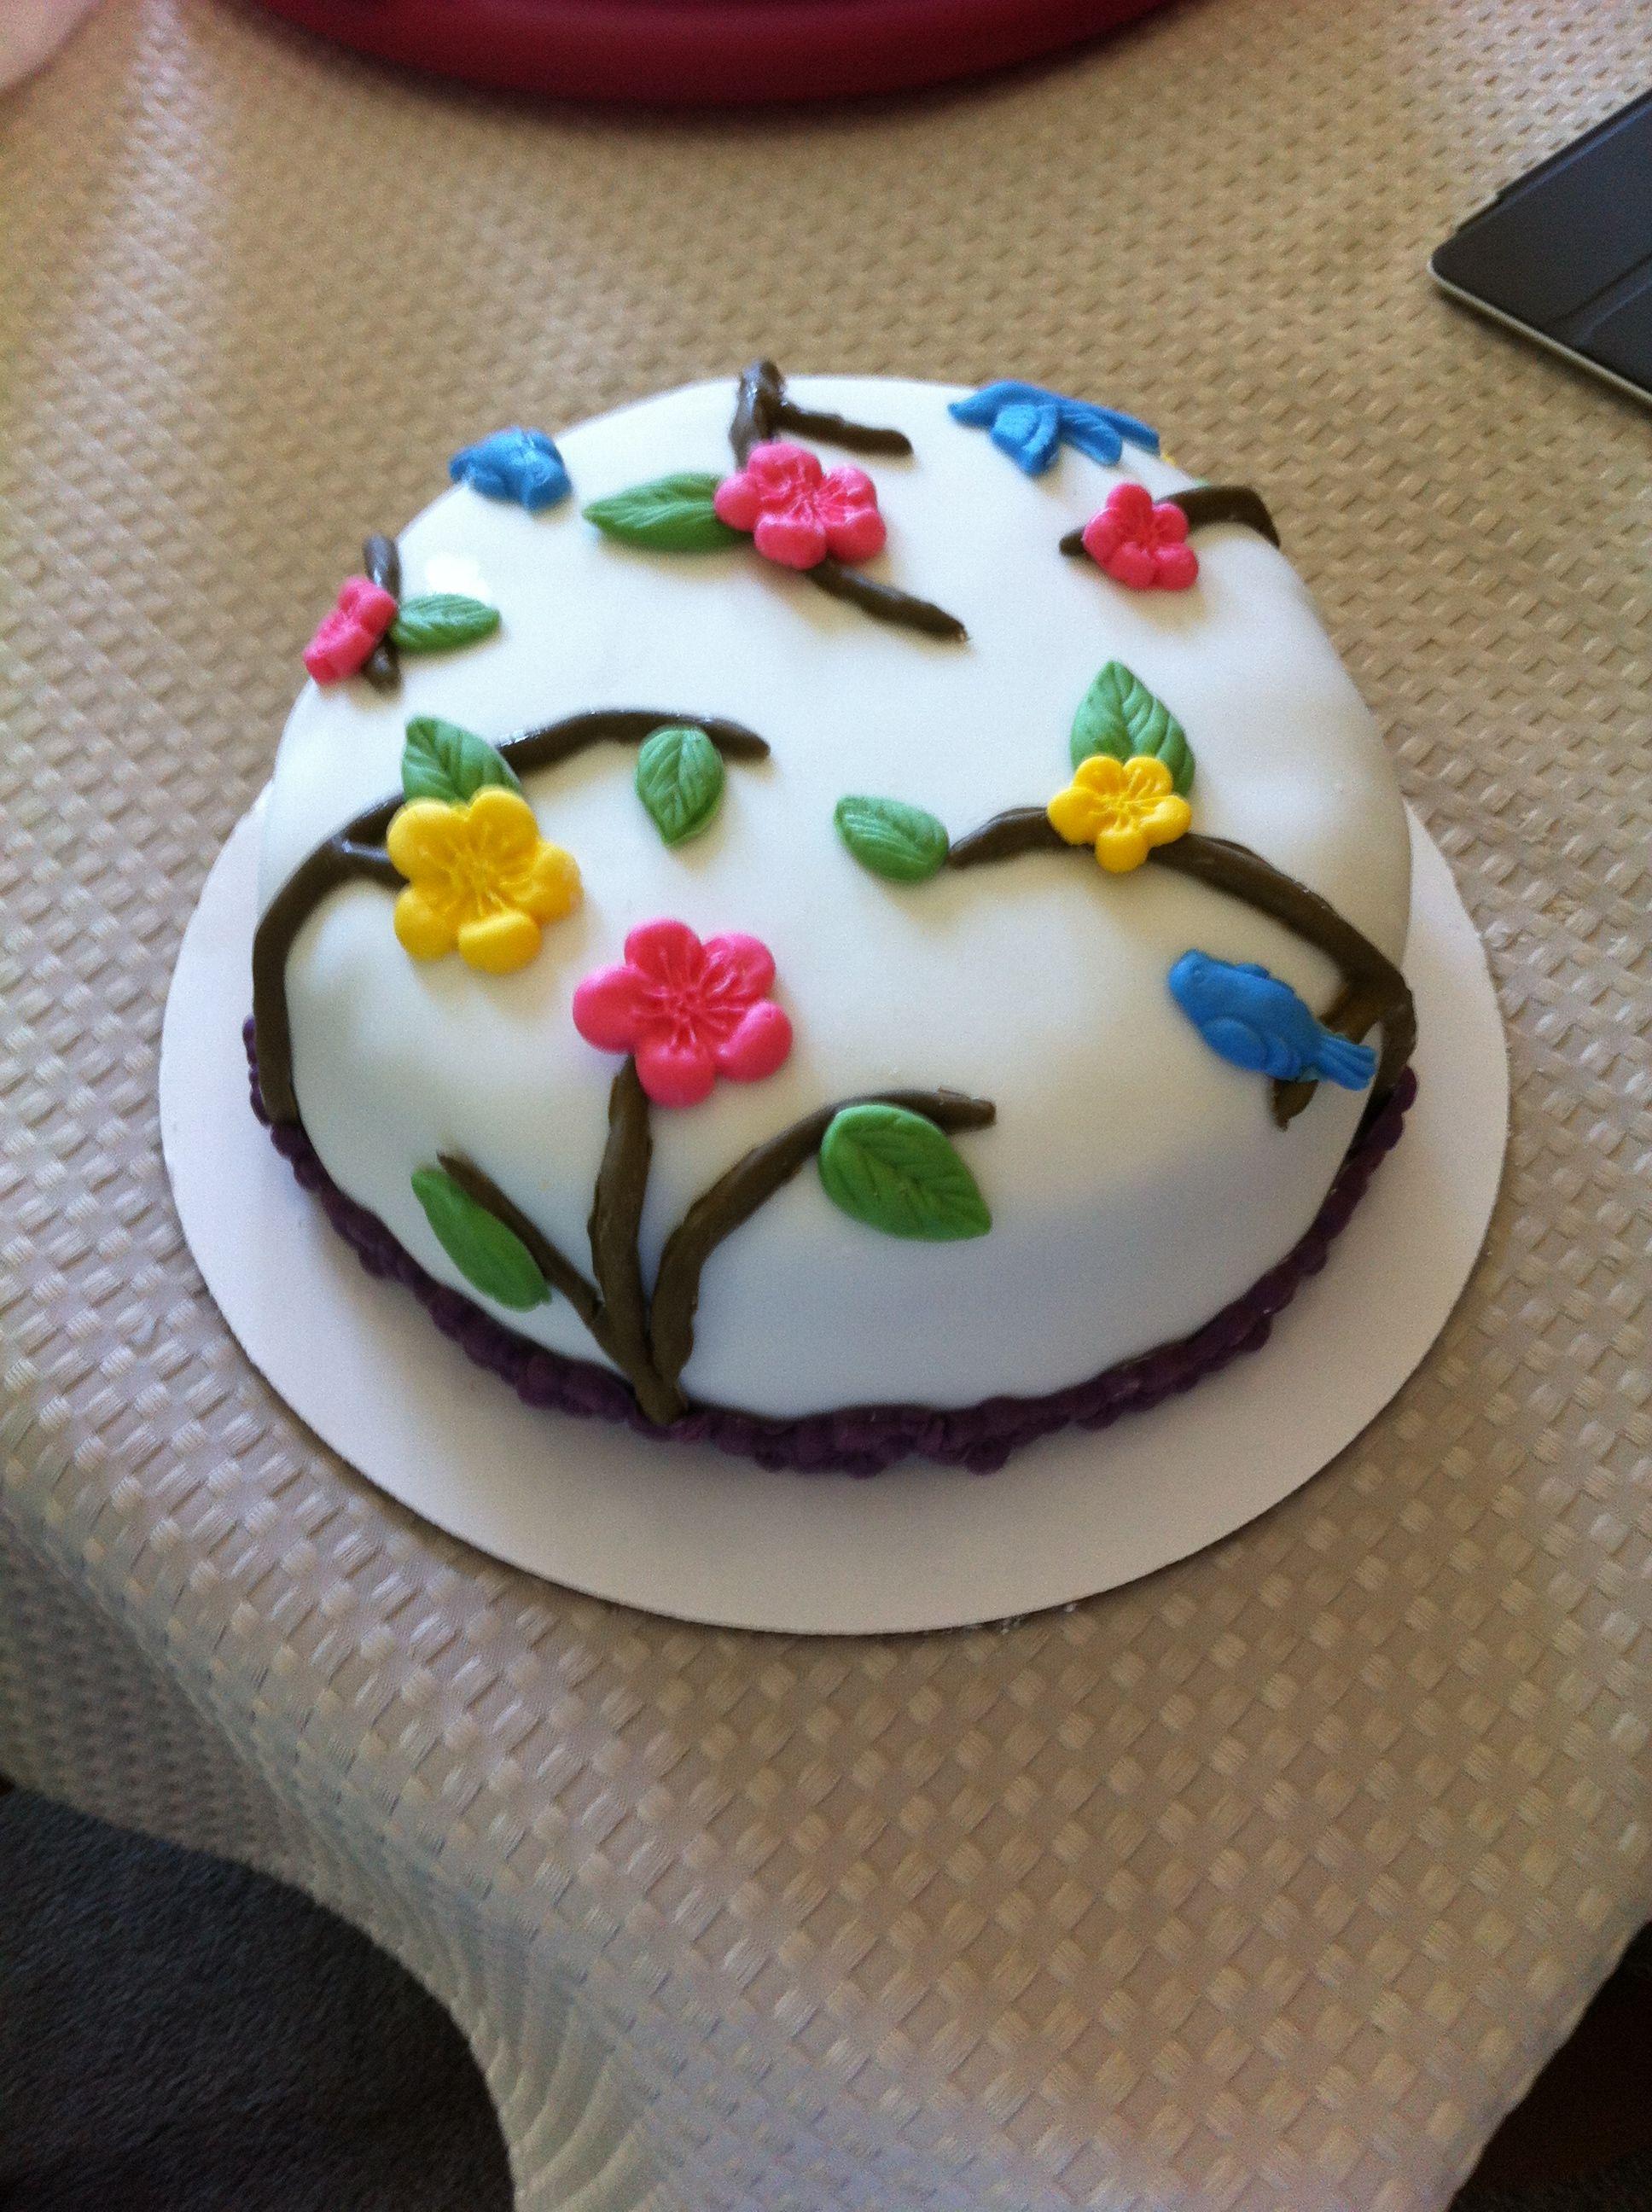 Nature (flowers & birds) cake